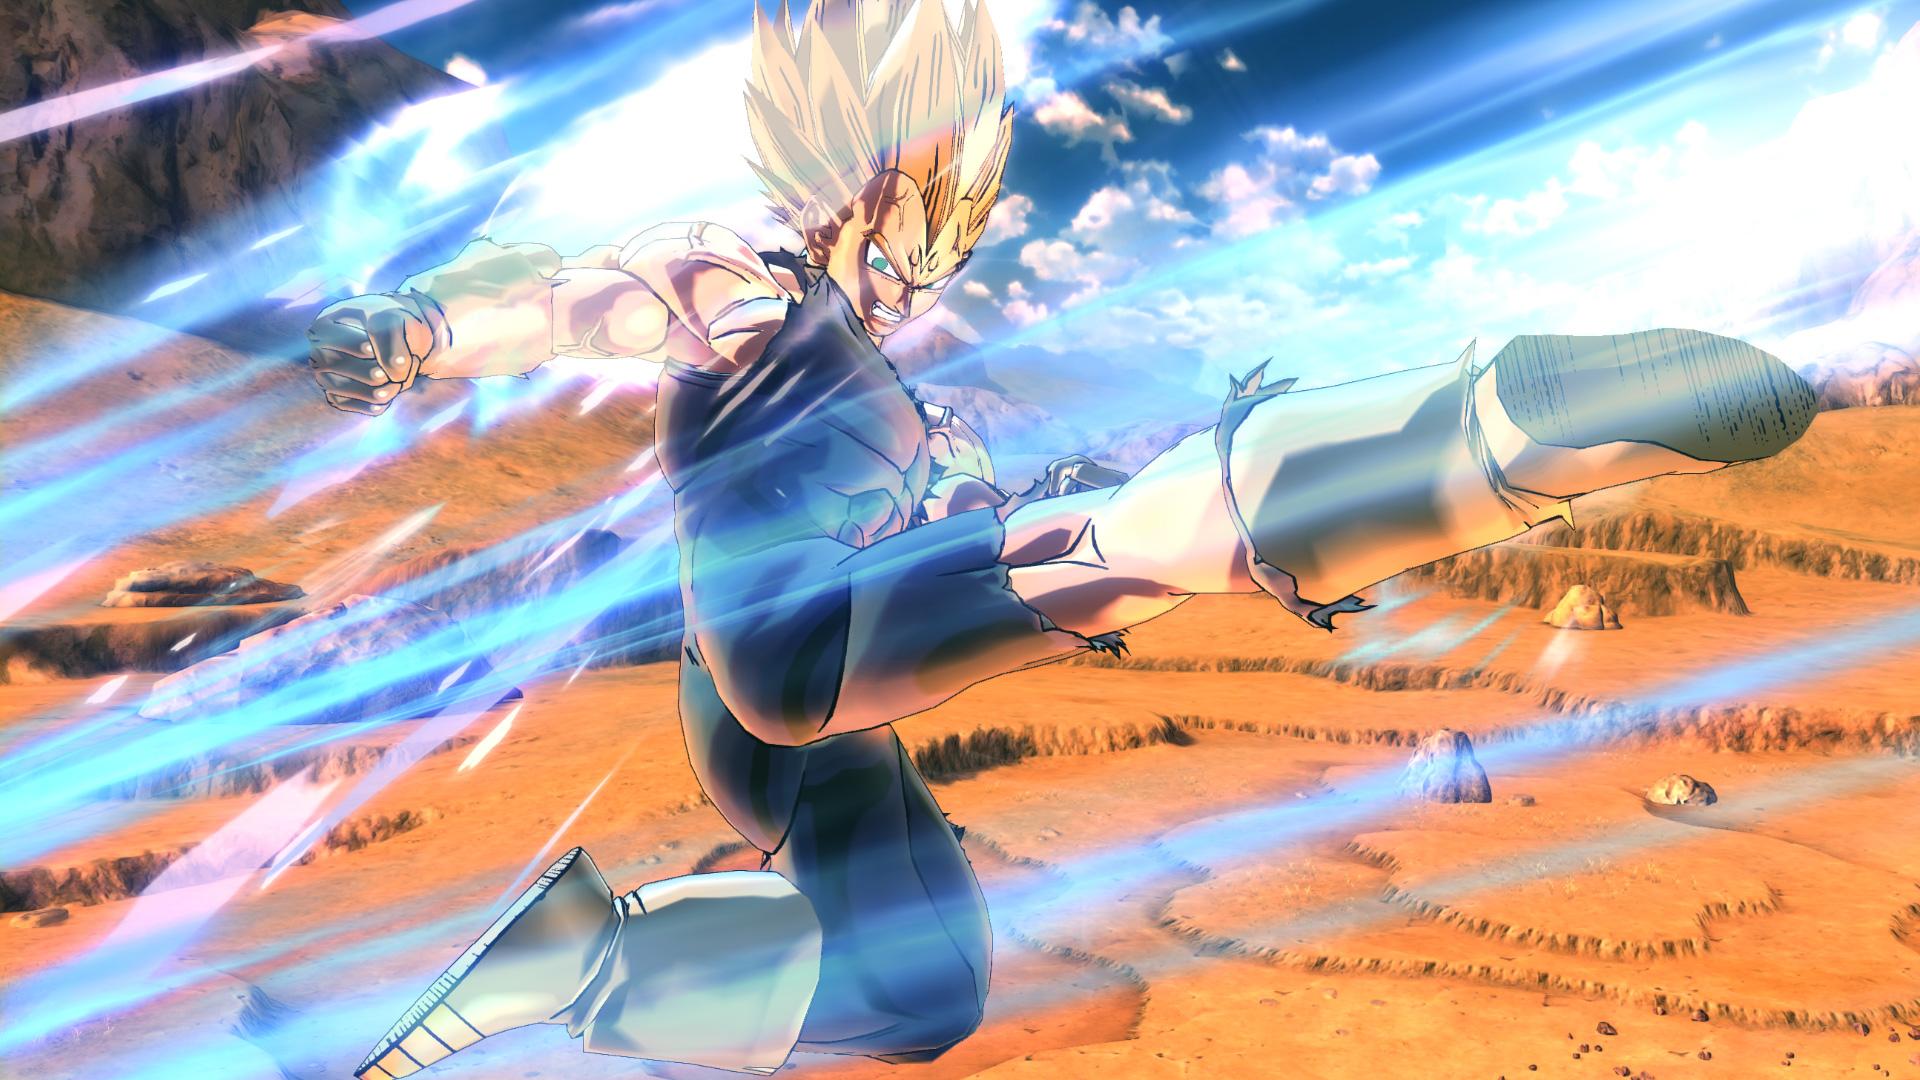 Dragon Ball Xenoverse 2 ESPAÑOL Descargar Full (CODEX) + REPACK 3 DVD5 (JPW) 8